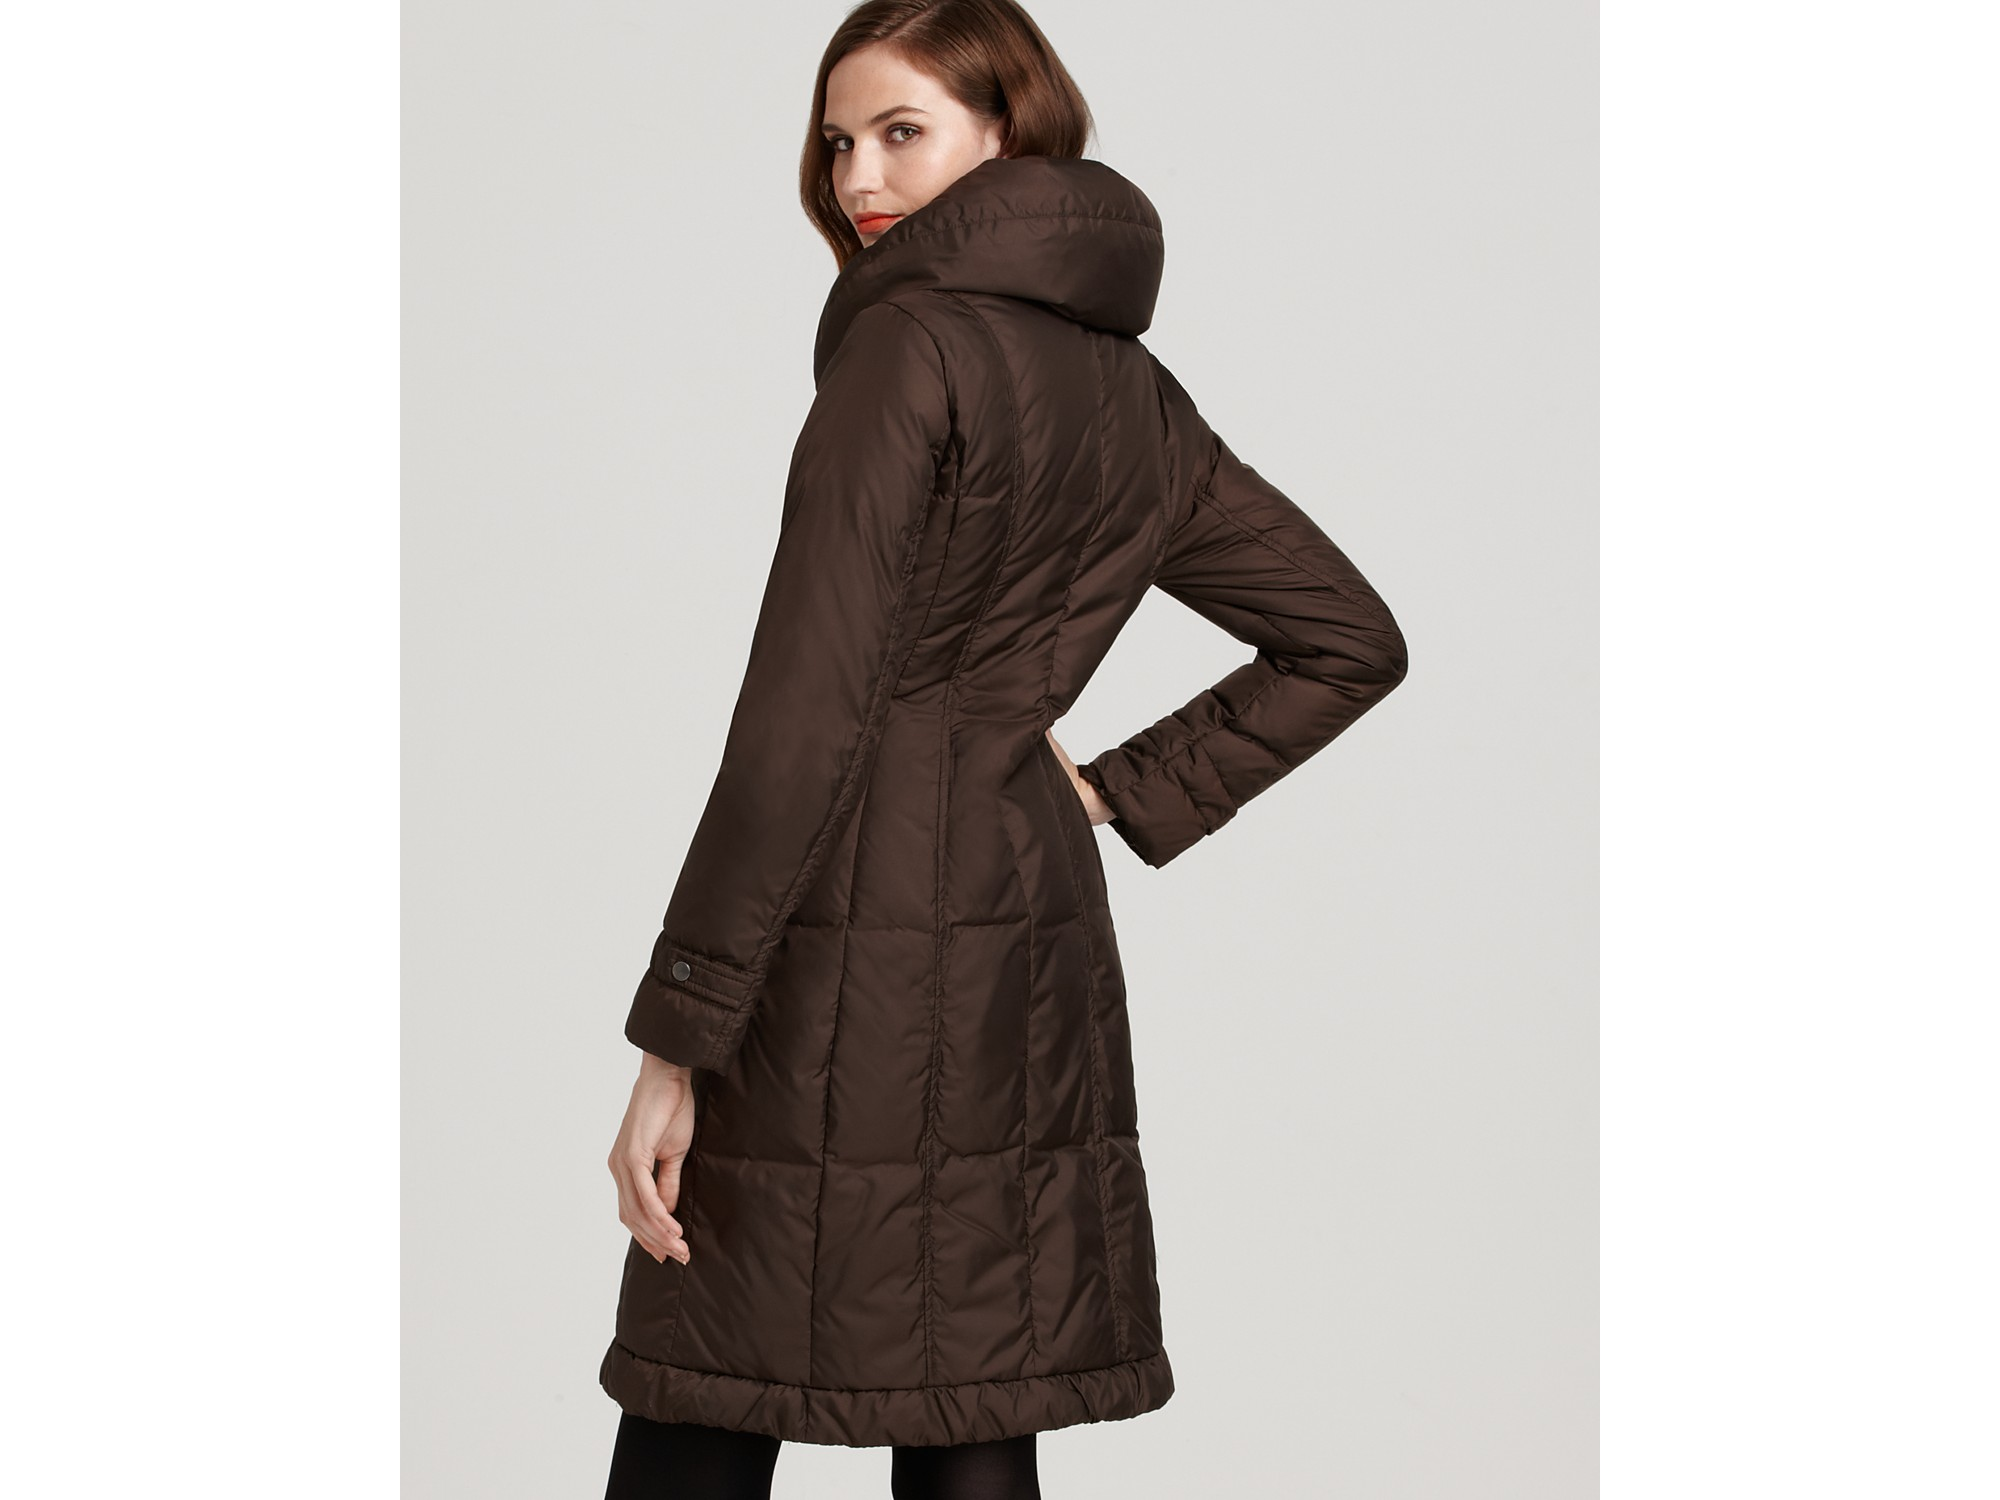 Cole haan Mid Length Down Coat in Brown   Lyst